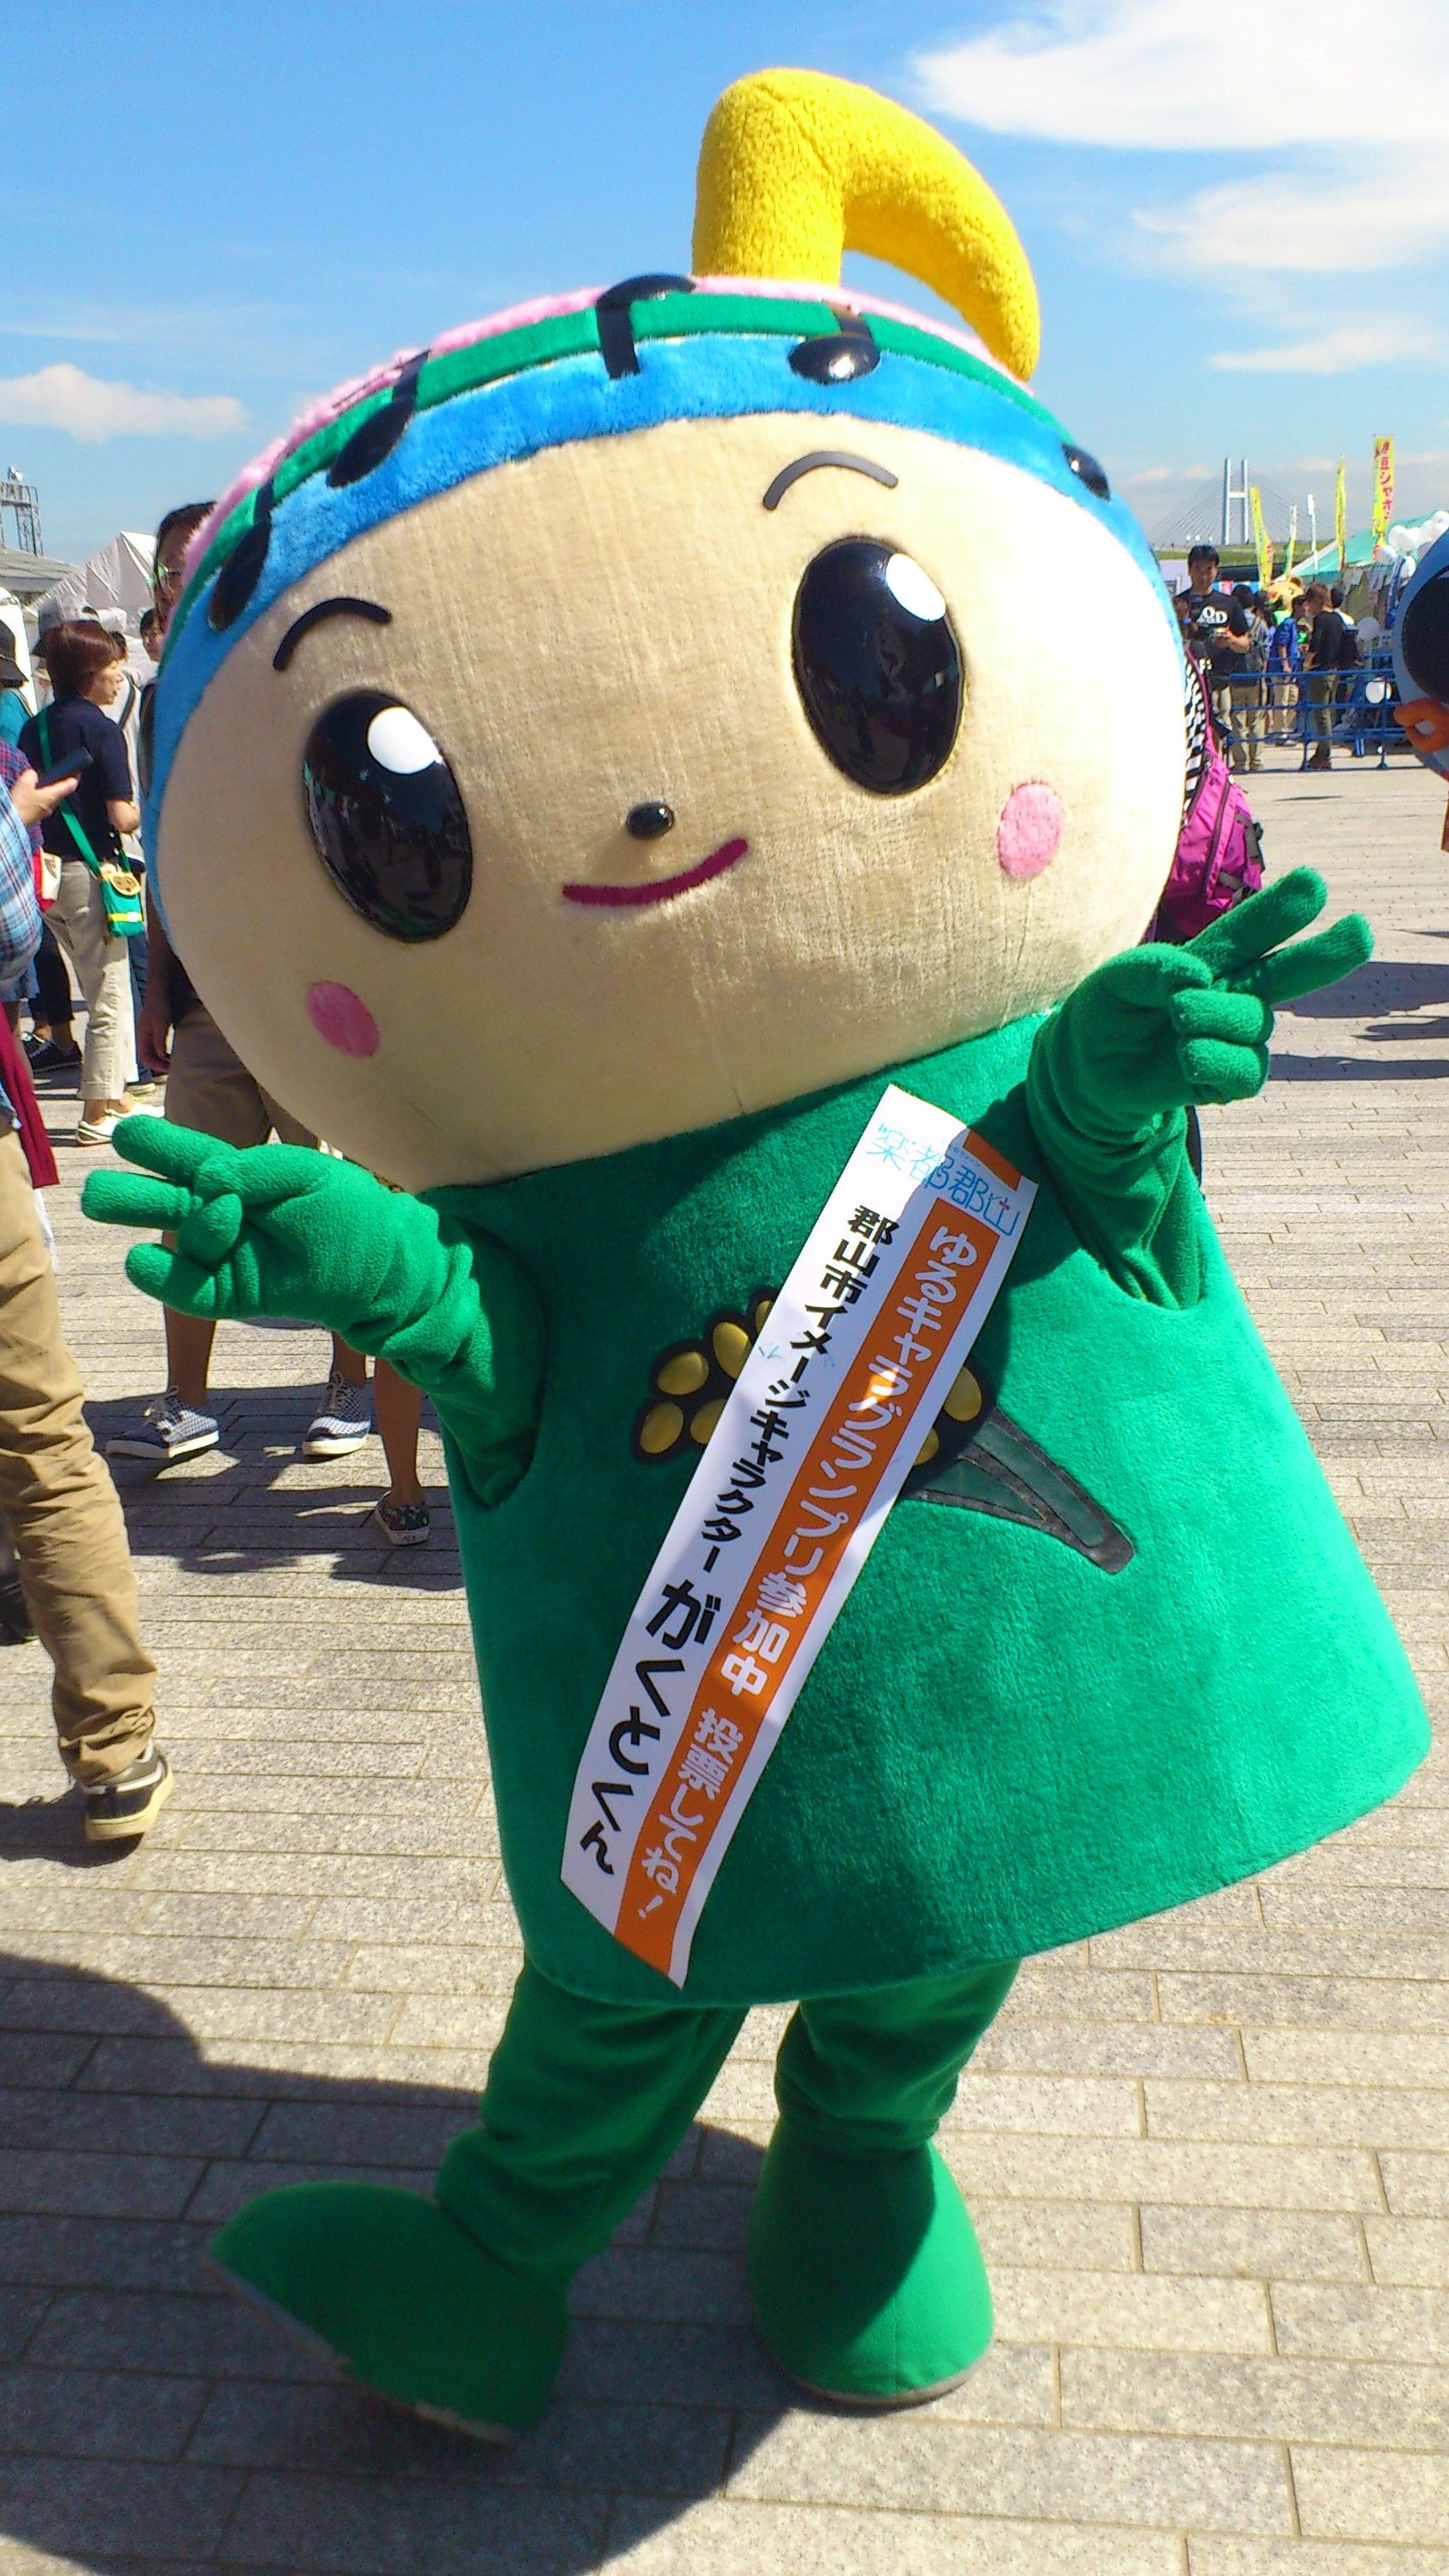 gakutokun koriyama city fukushima pref http www city koriyama fukushima jp index html mascot cute red bricks